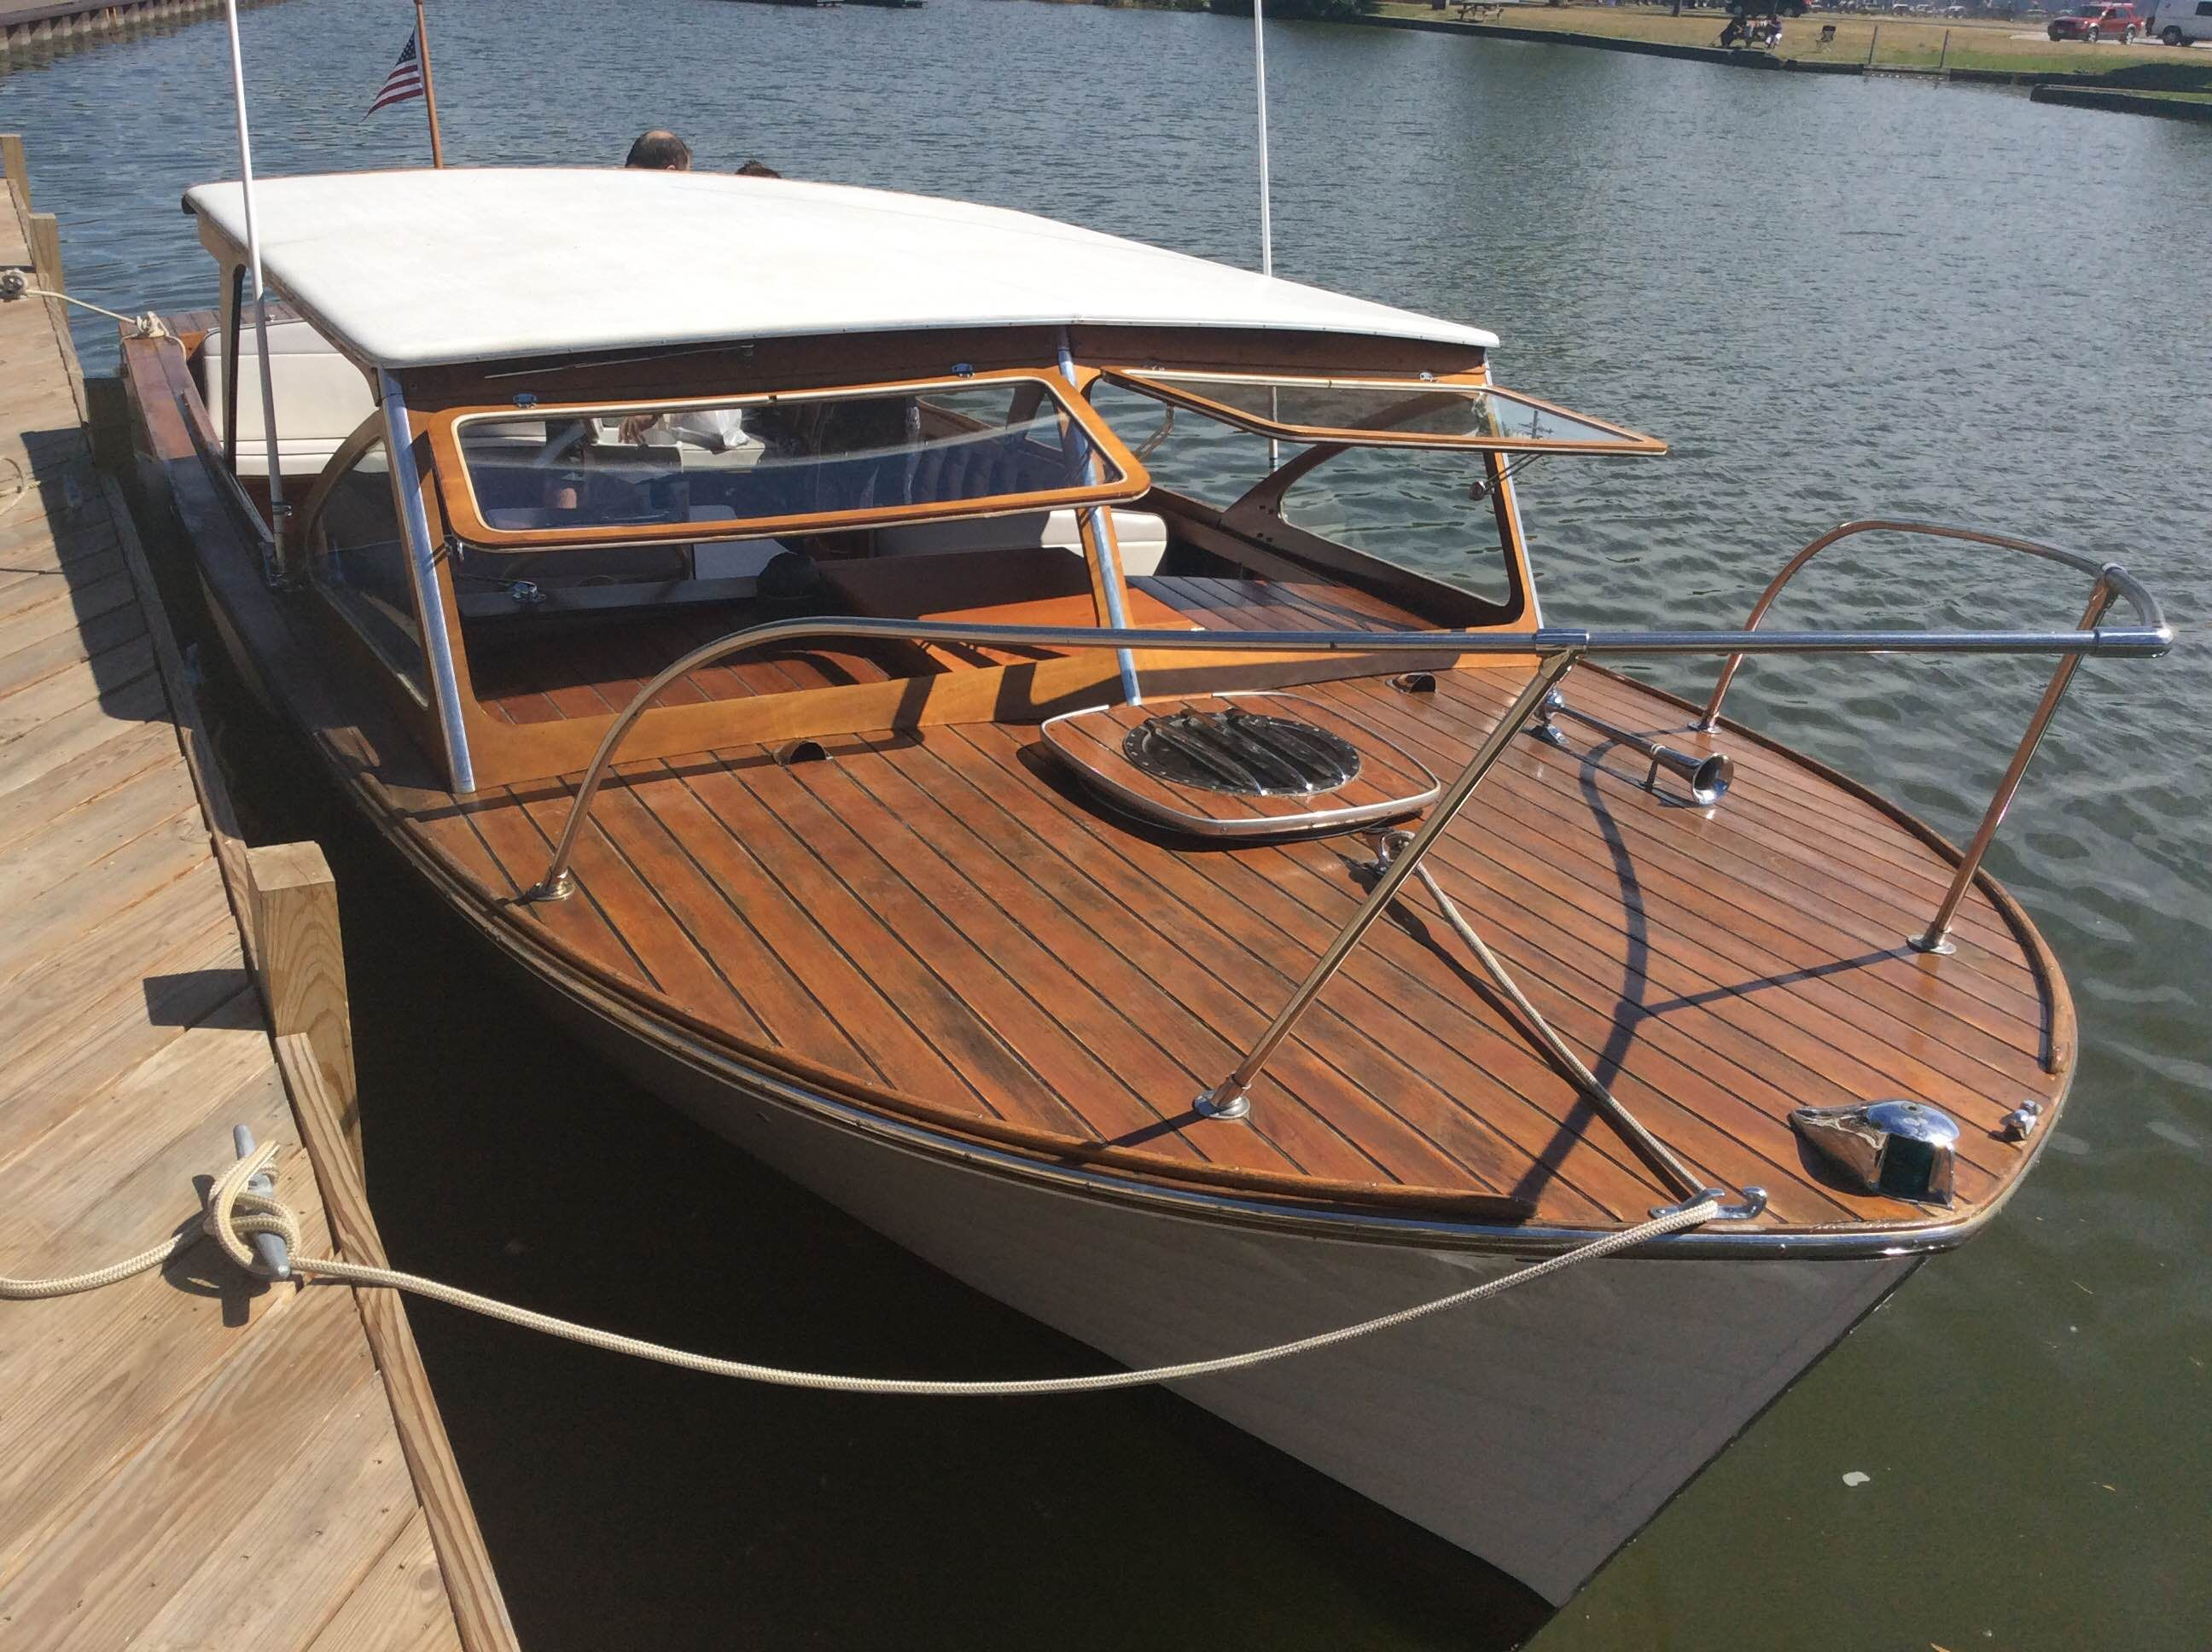 1961 Lyman Hardtop & 1961 Lyman Hardtop | Lyman Boats For Sale | Pinterest | Boating ...